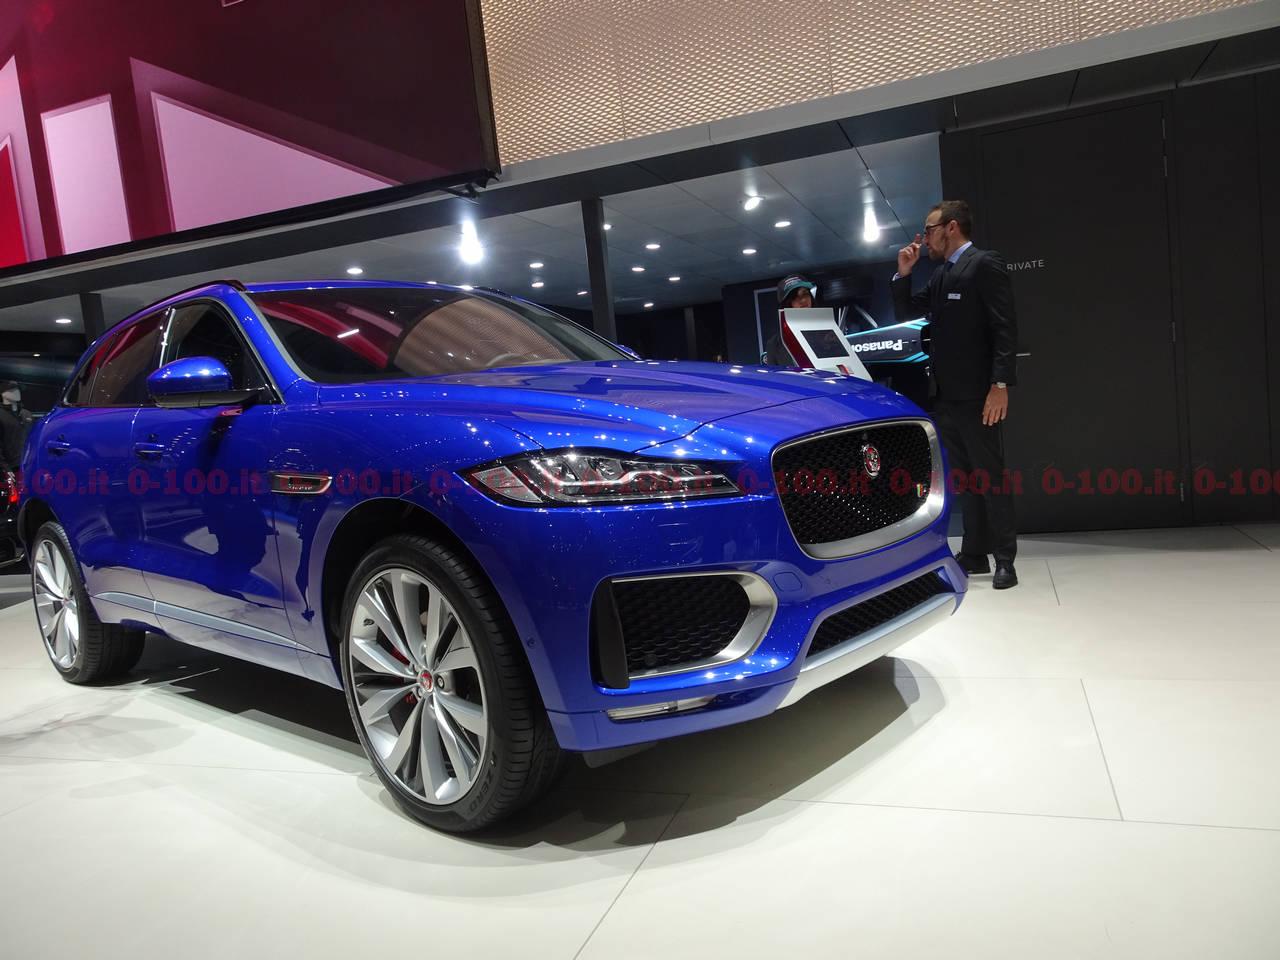 geneva-geneve-ginevra-2017-salone-auto-show_jaguar-f-pace_0-100_1